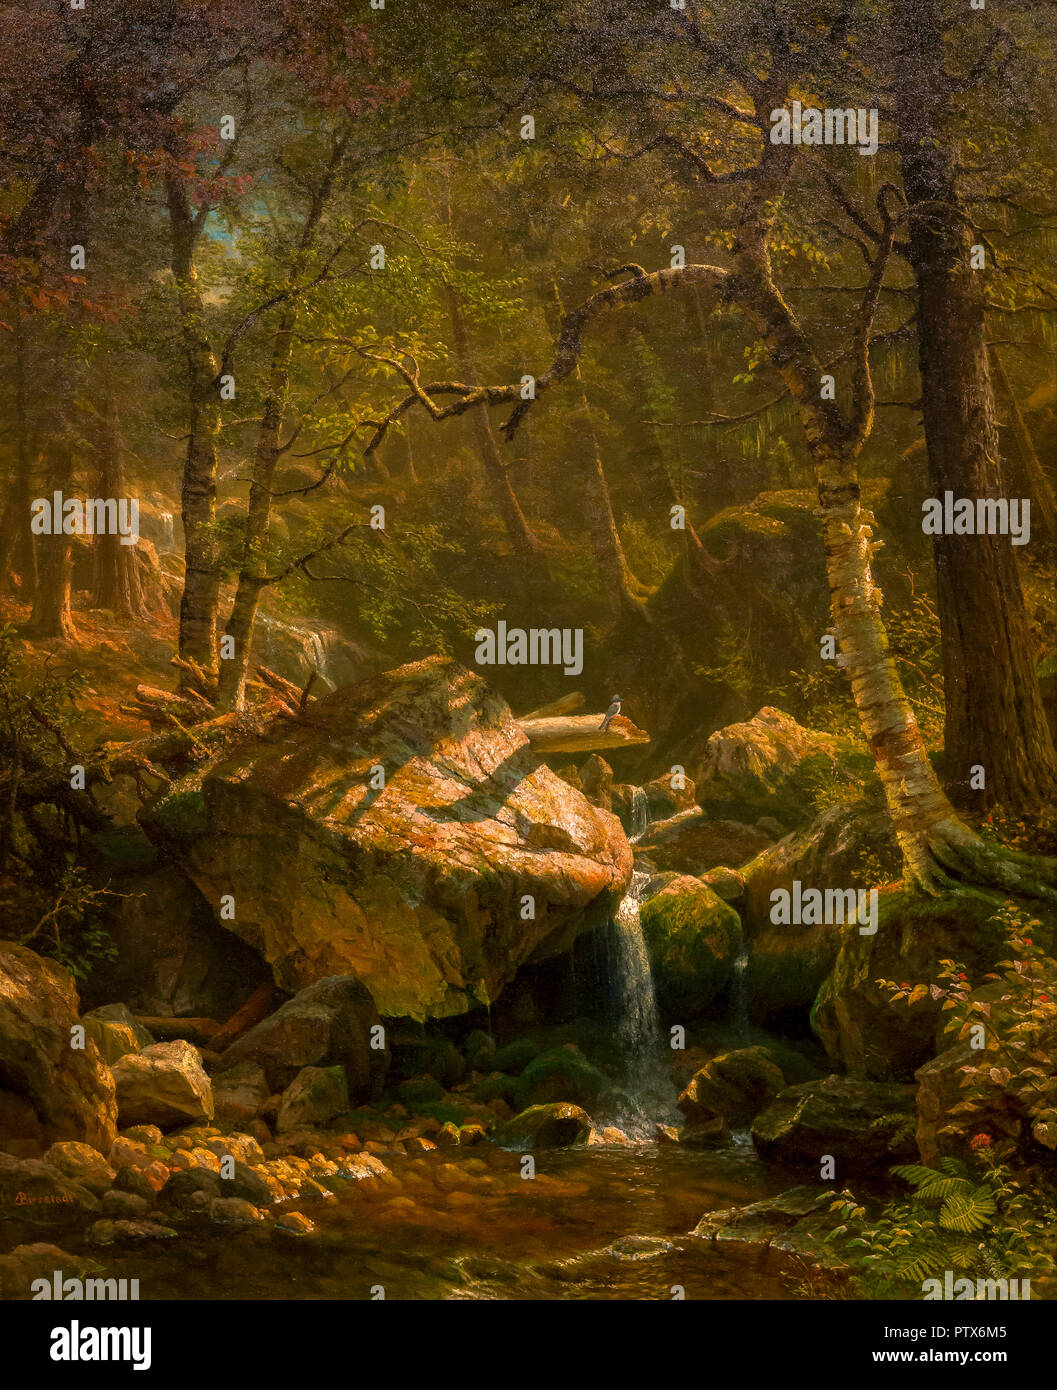 Mountain Brook, Albert Bierstadt, 1863, Art Institute of Chicago, Chicago, Illinois, USA, North America - Stock Image